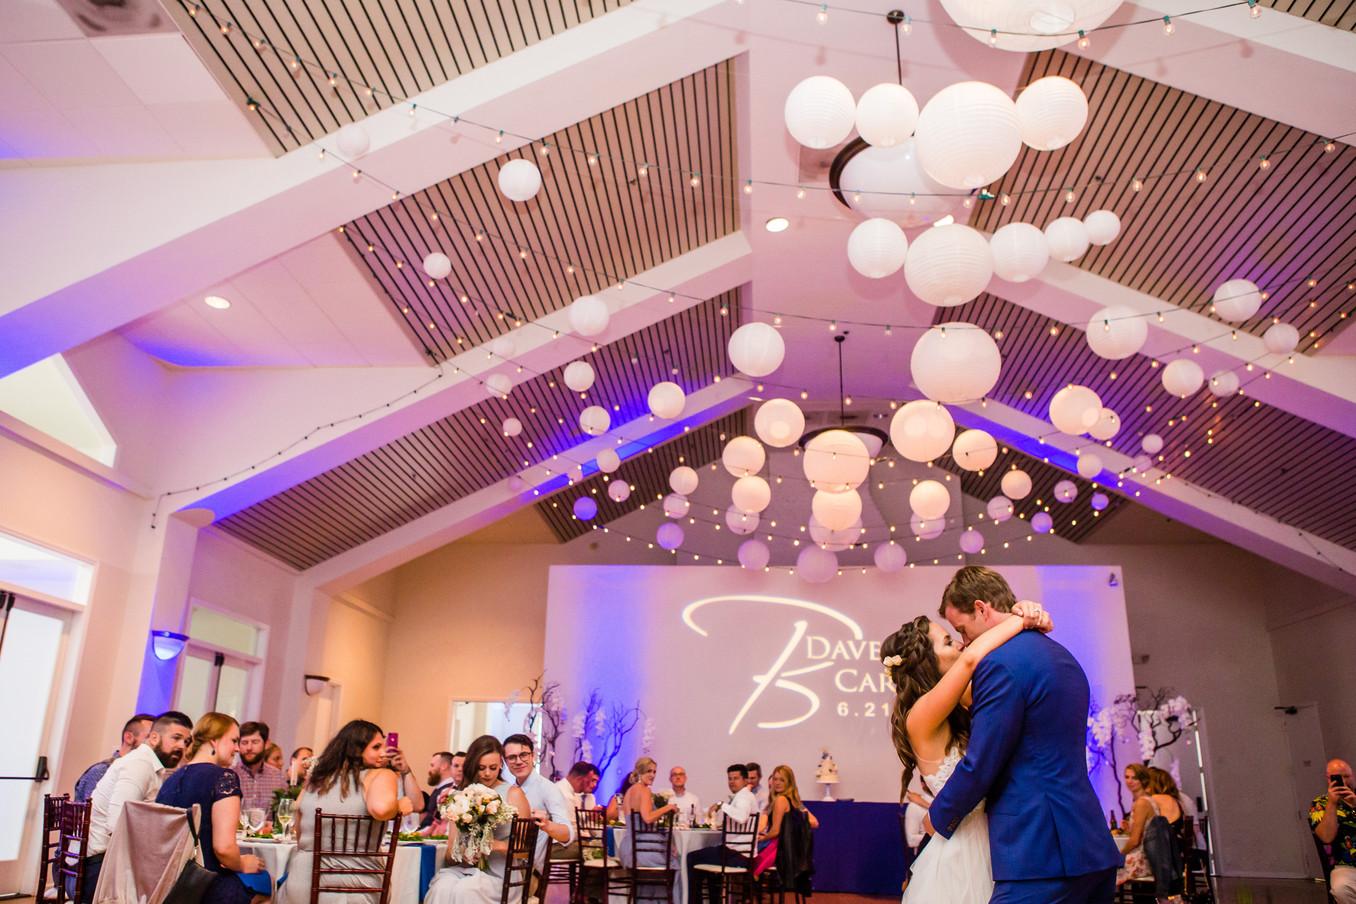 San Diego Wedding Photographer, Berlynn Photography, San Diego Wedding Photography, bride and groom kiss at reception